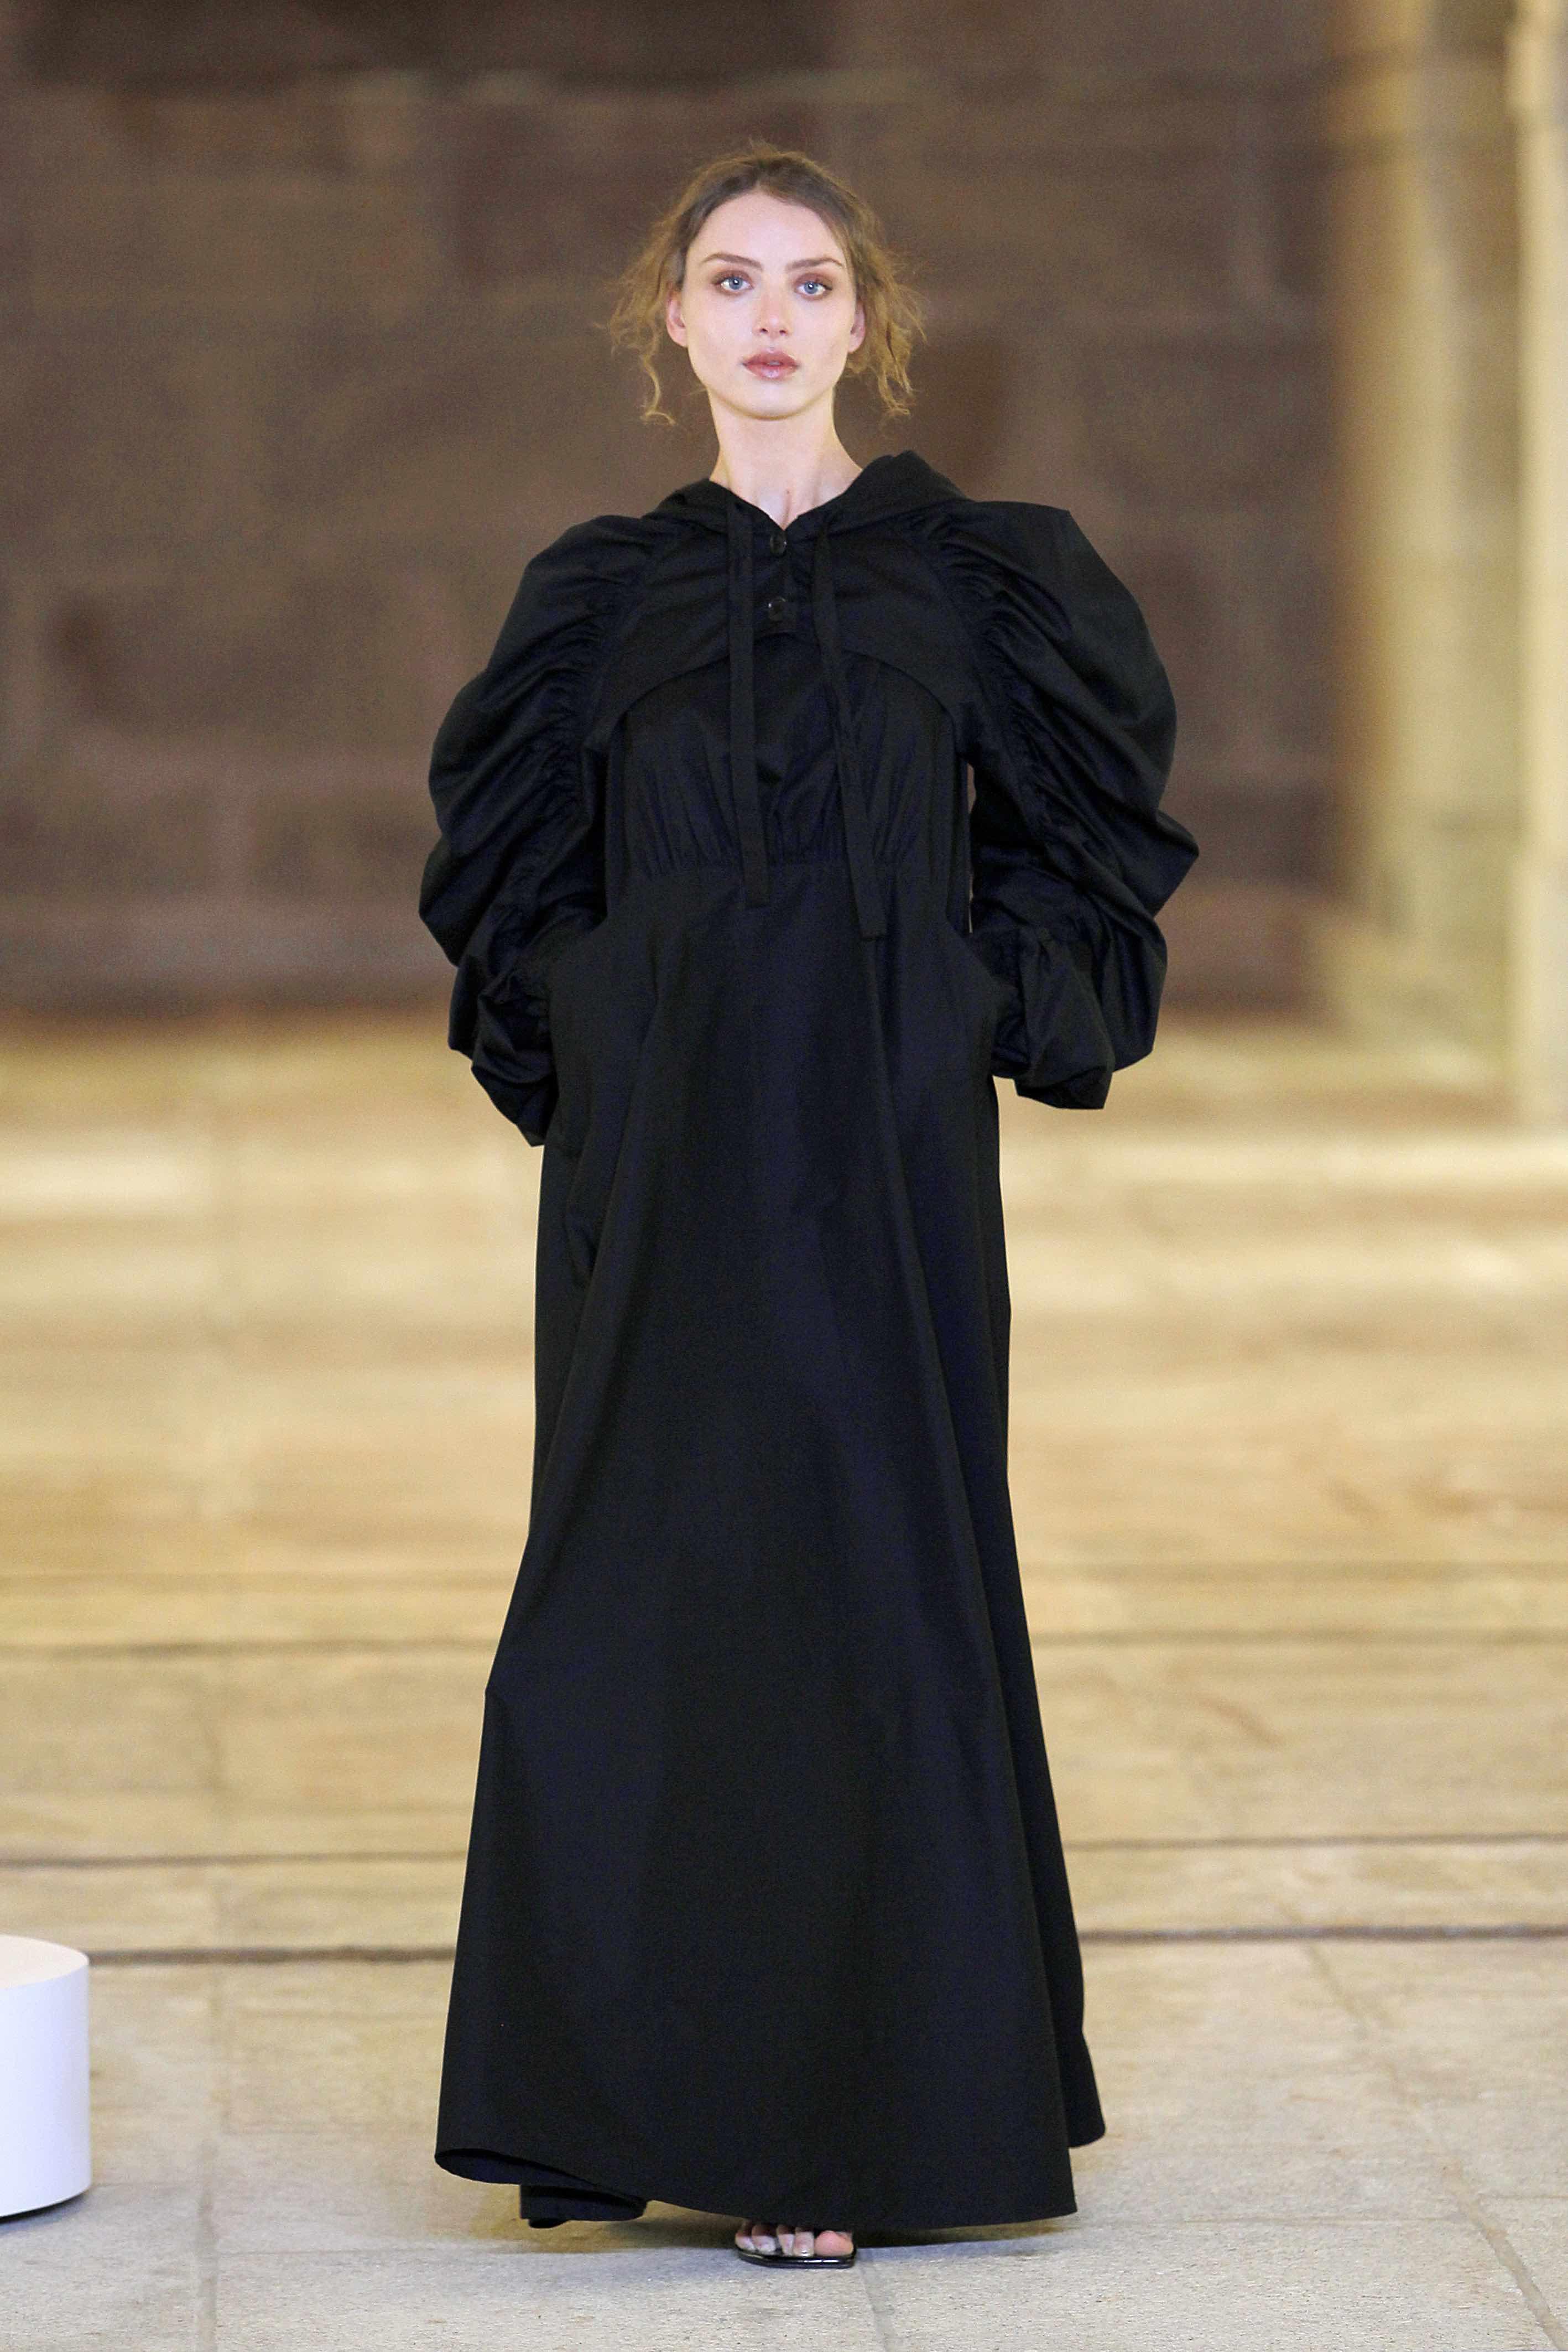 Portugal Fashion #SofaEdition 4